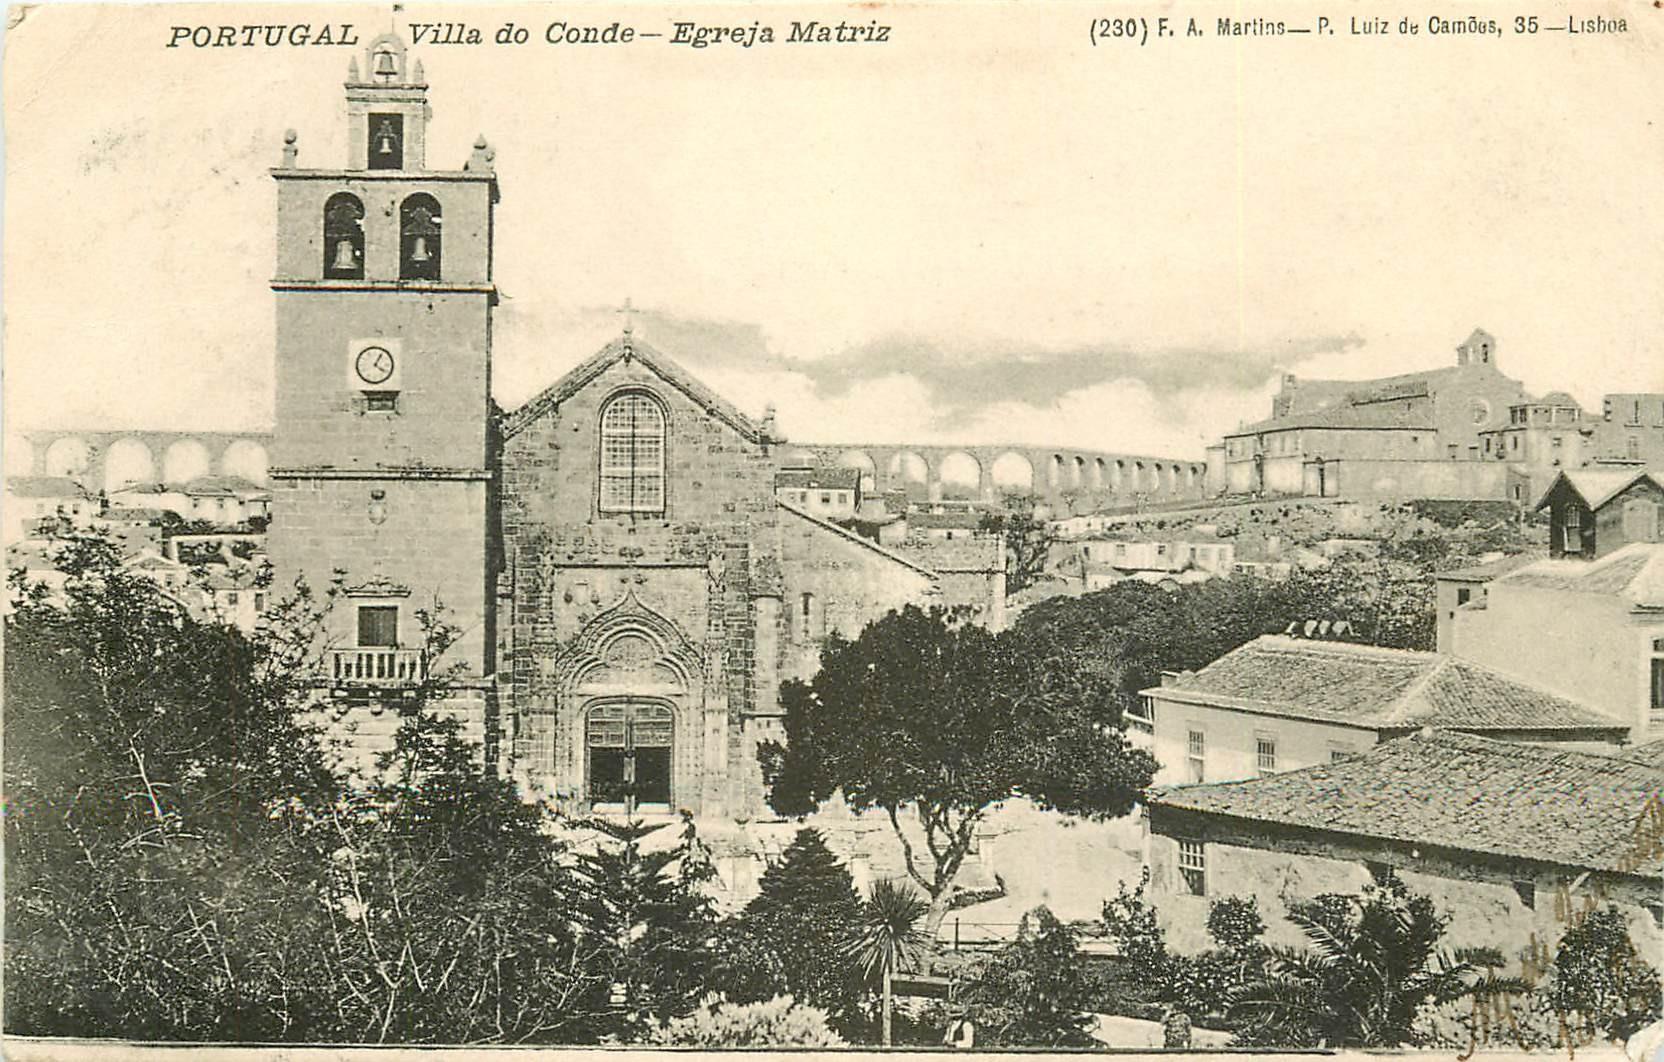 PORTUGAL. Villa do Conde Egreja Matriz